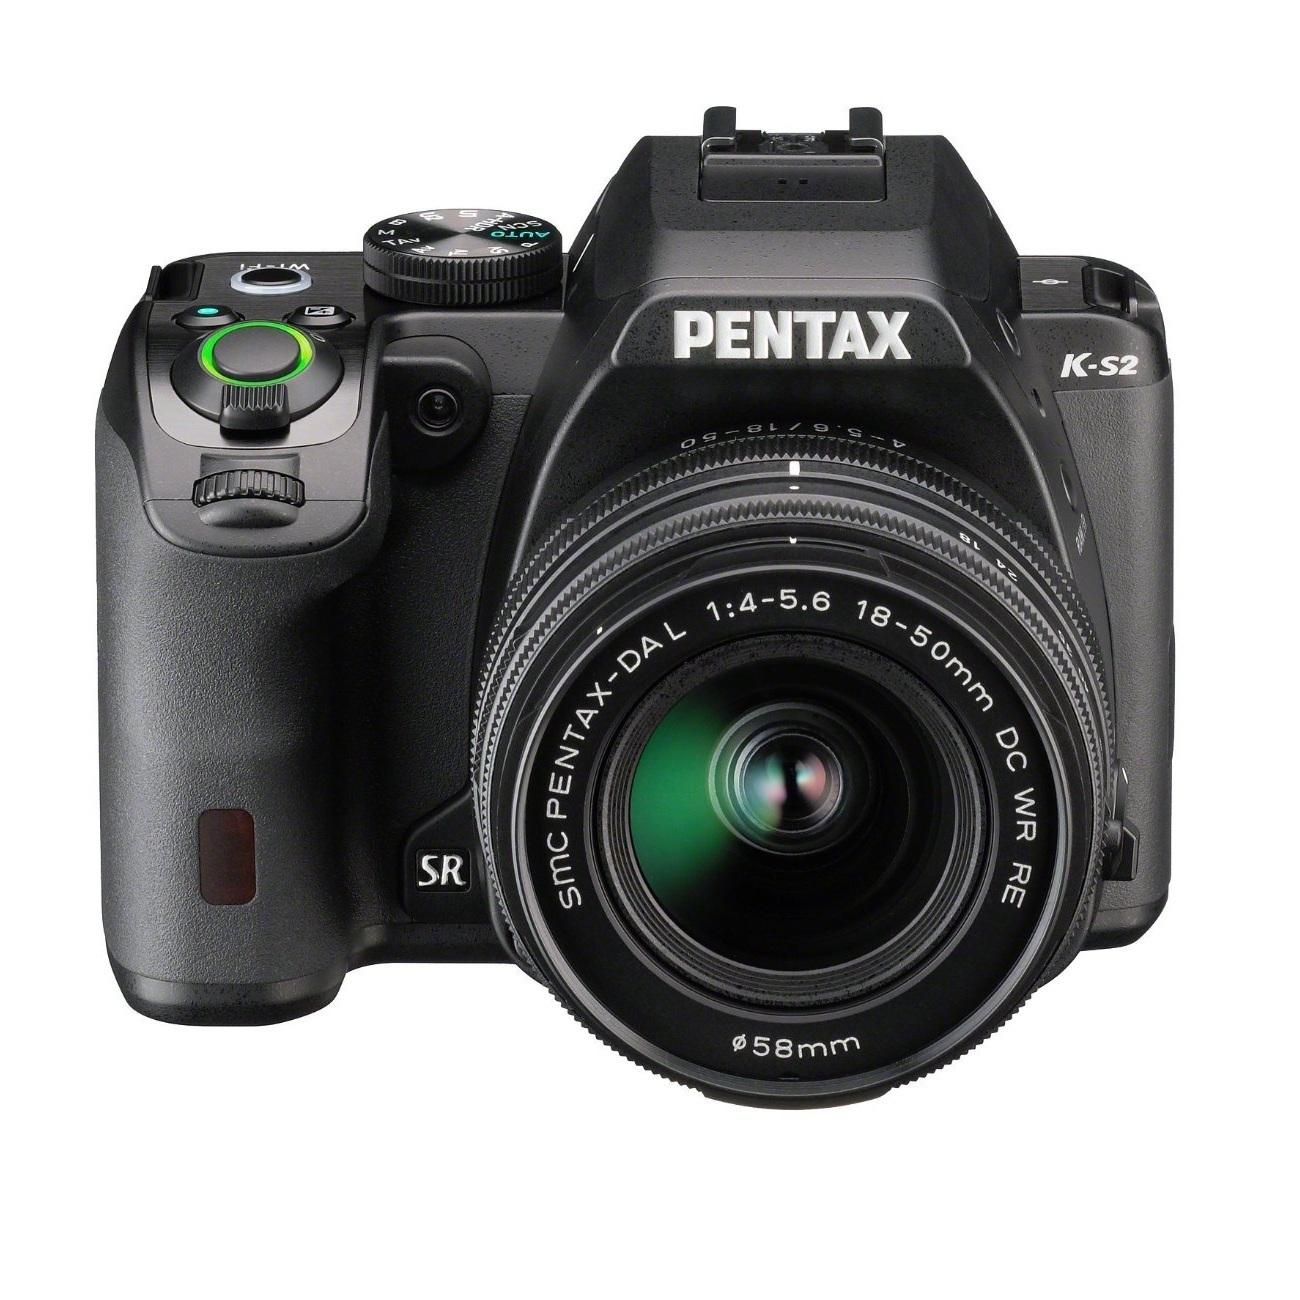 Camera Pentax Dslr Cameras For Sale pentax dslr for sale price list brands review k s2 20mp with 18 50mm lens